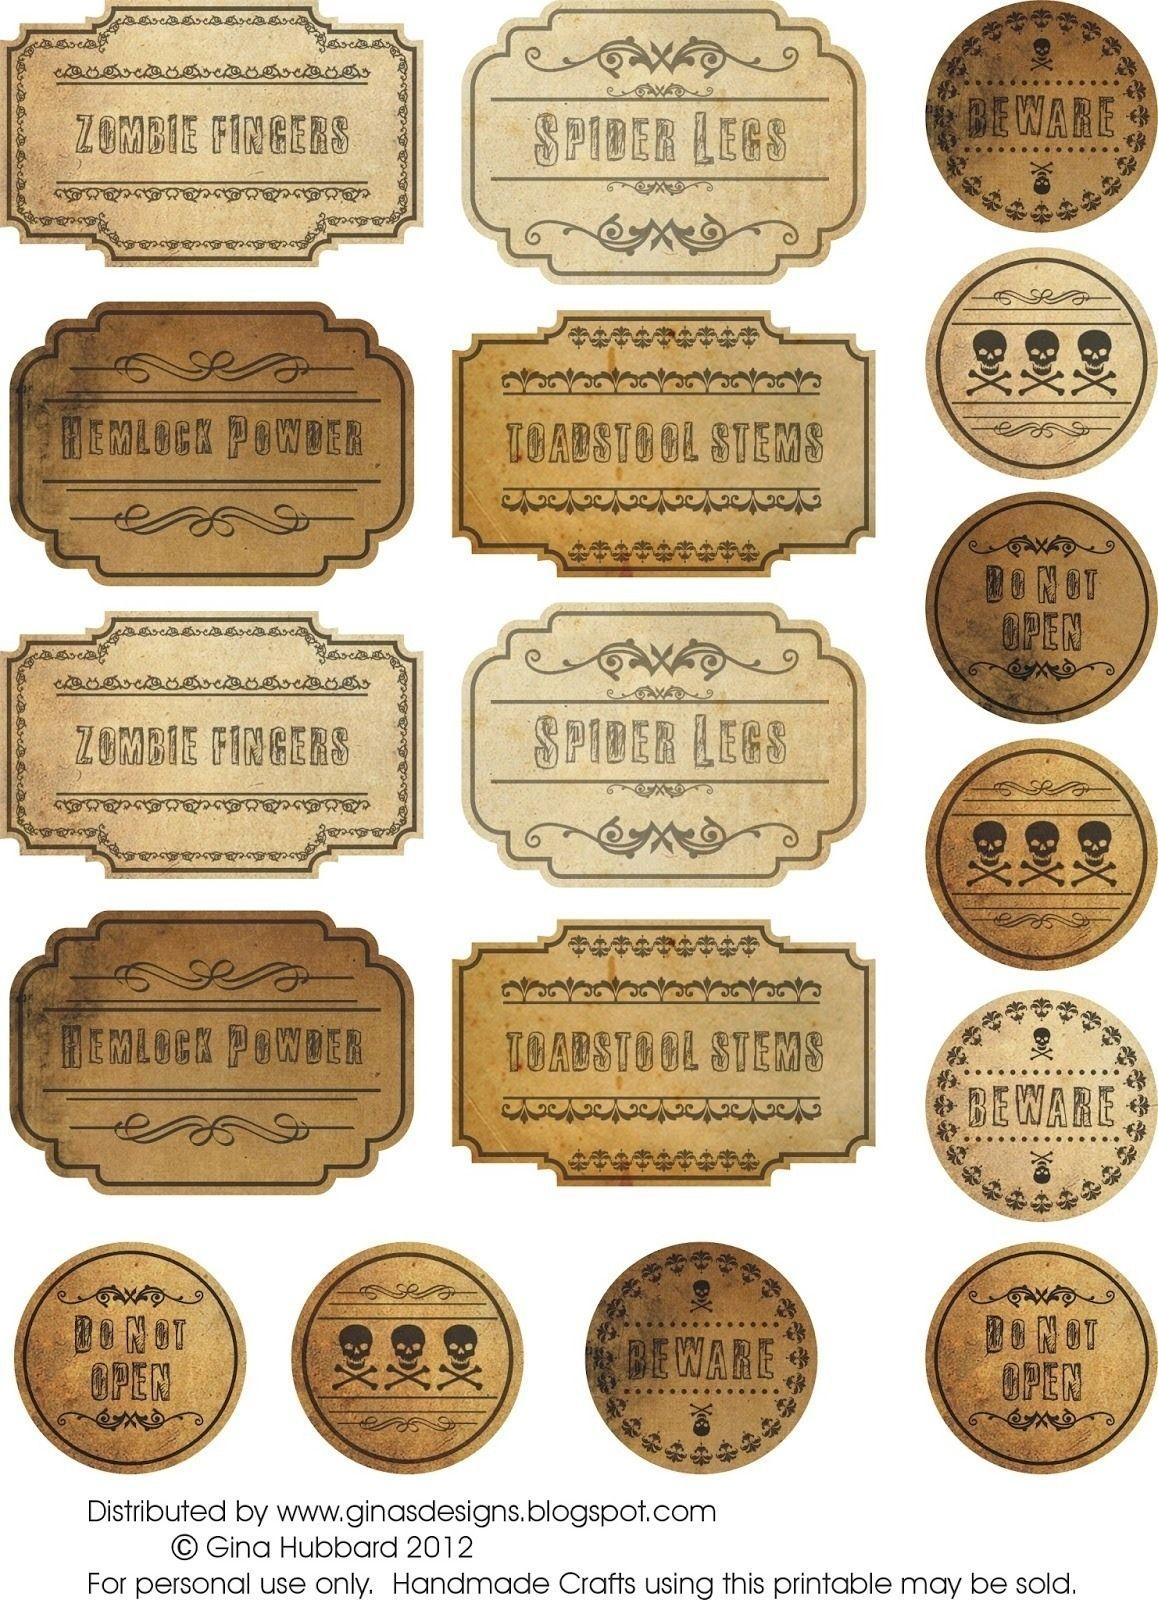 25 Beautiful Photo Of Scrapbook Printables Stickers Scrapbook Printables Stickers Vintage Scrapbook De Vintage Scrapbook Scrapbook Designs Printable Stickers